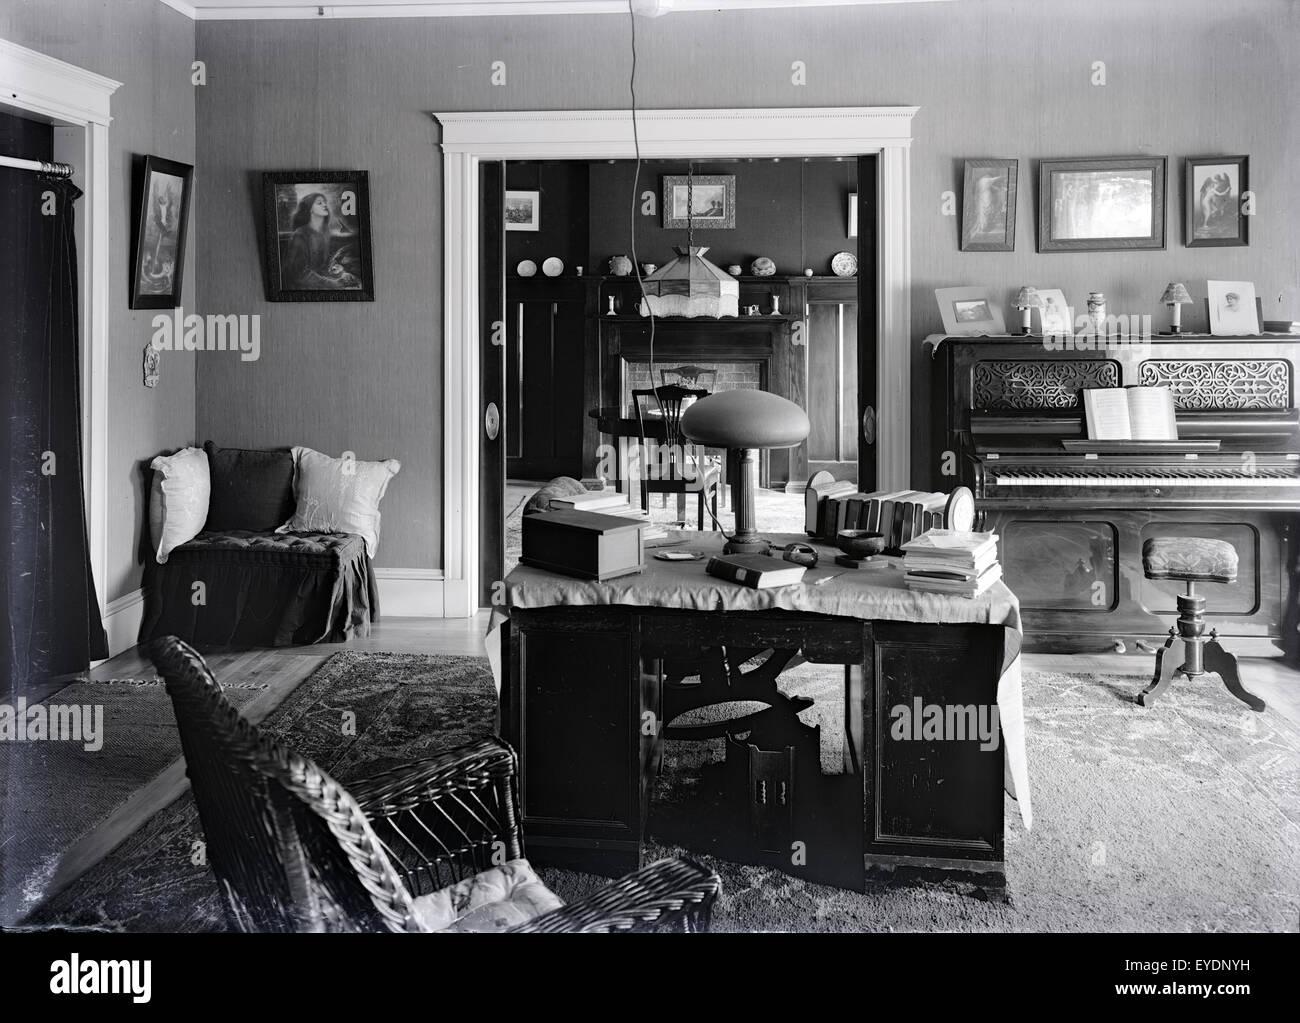 Antique C1910 Photograph Of A Late Victorian Circa 1910s